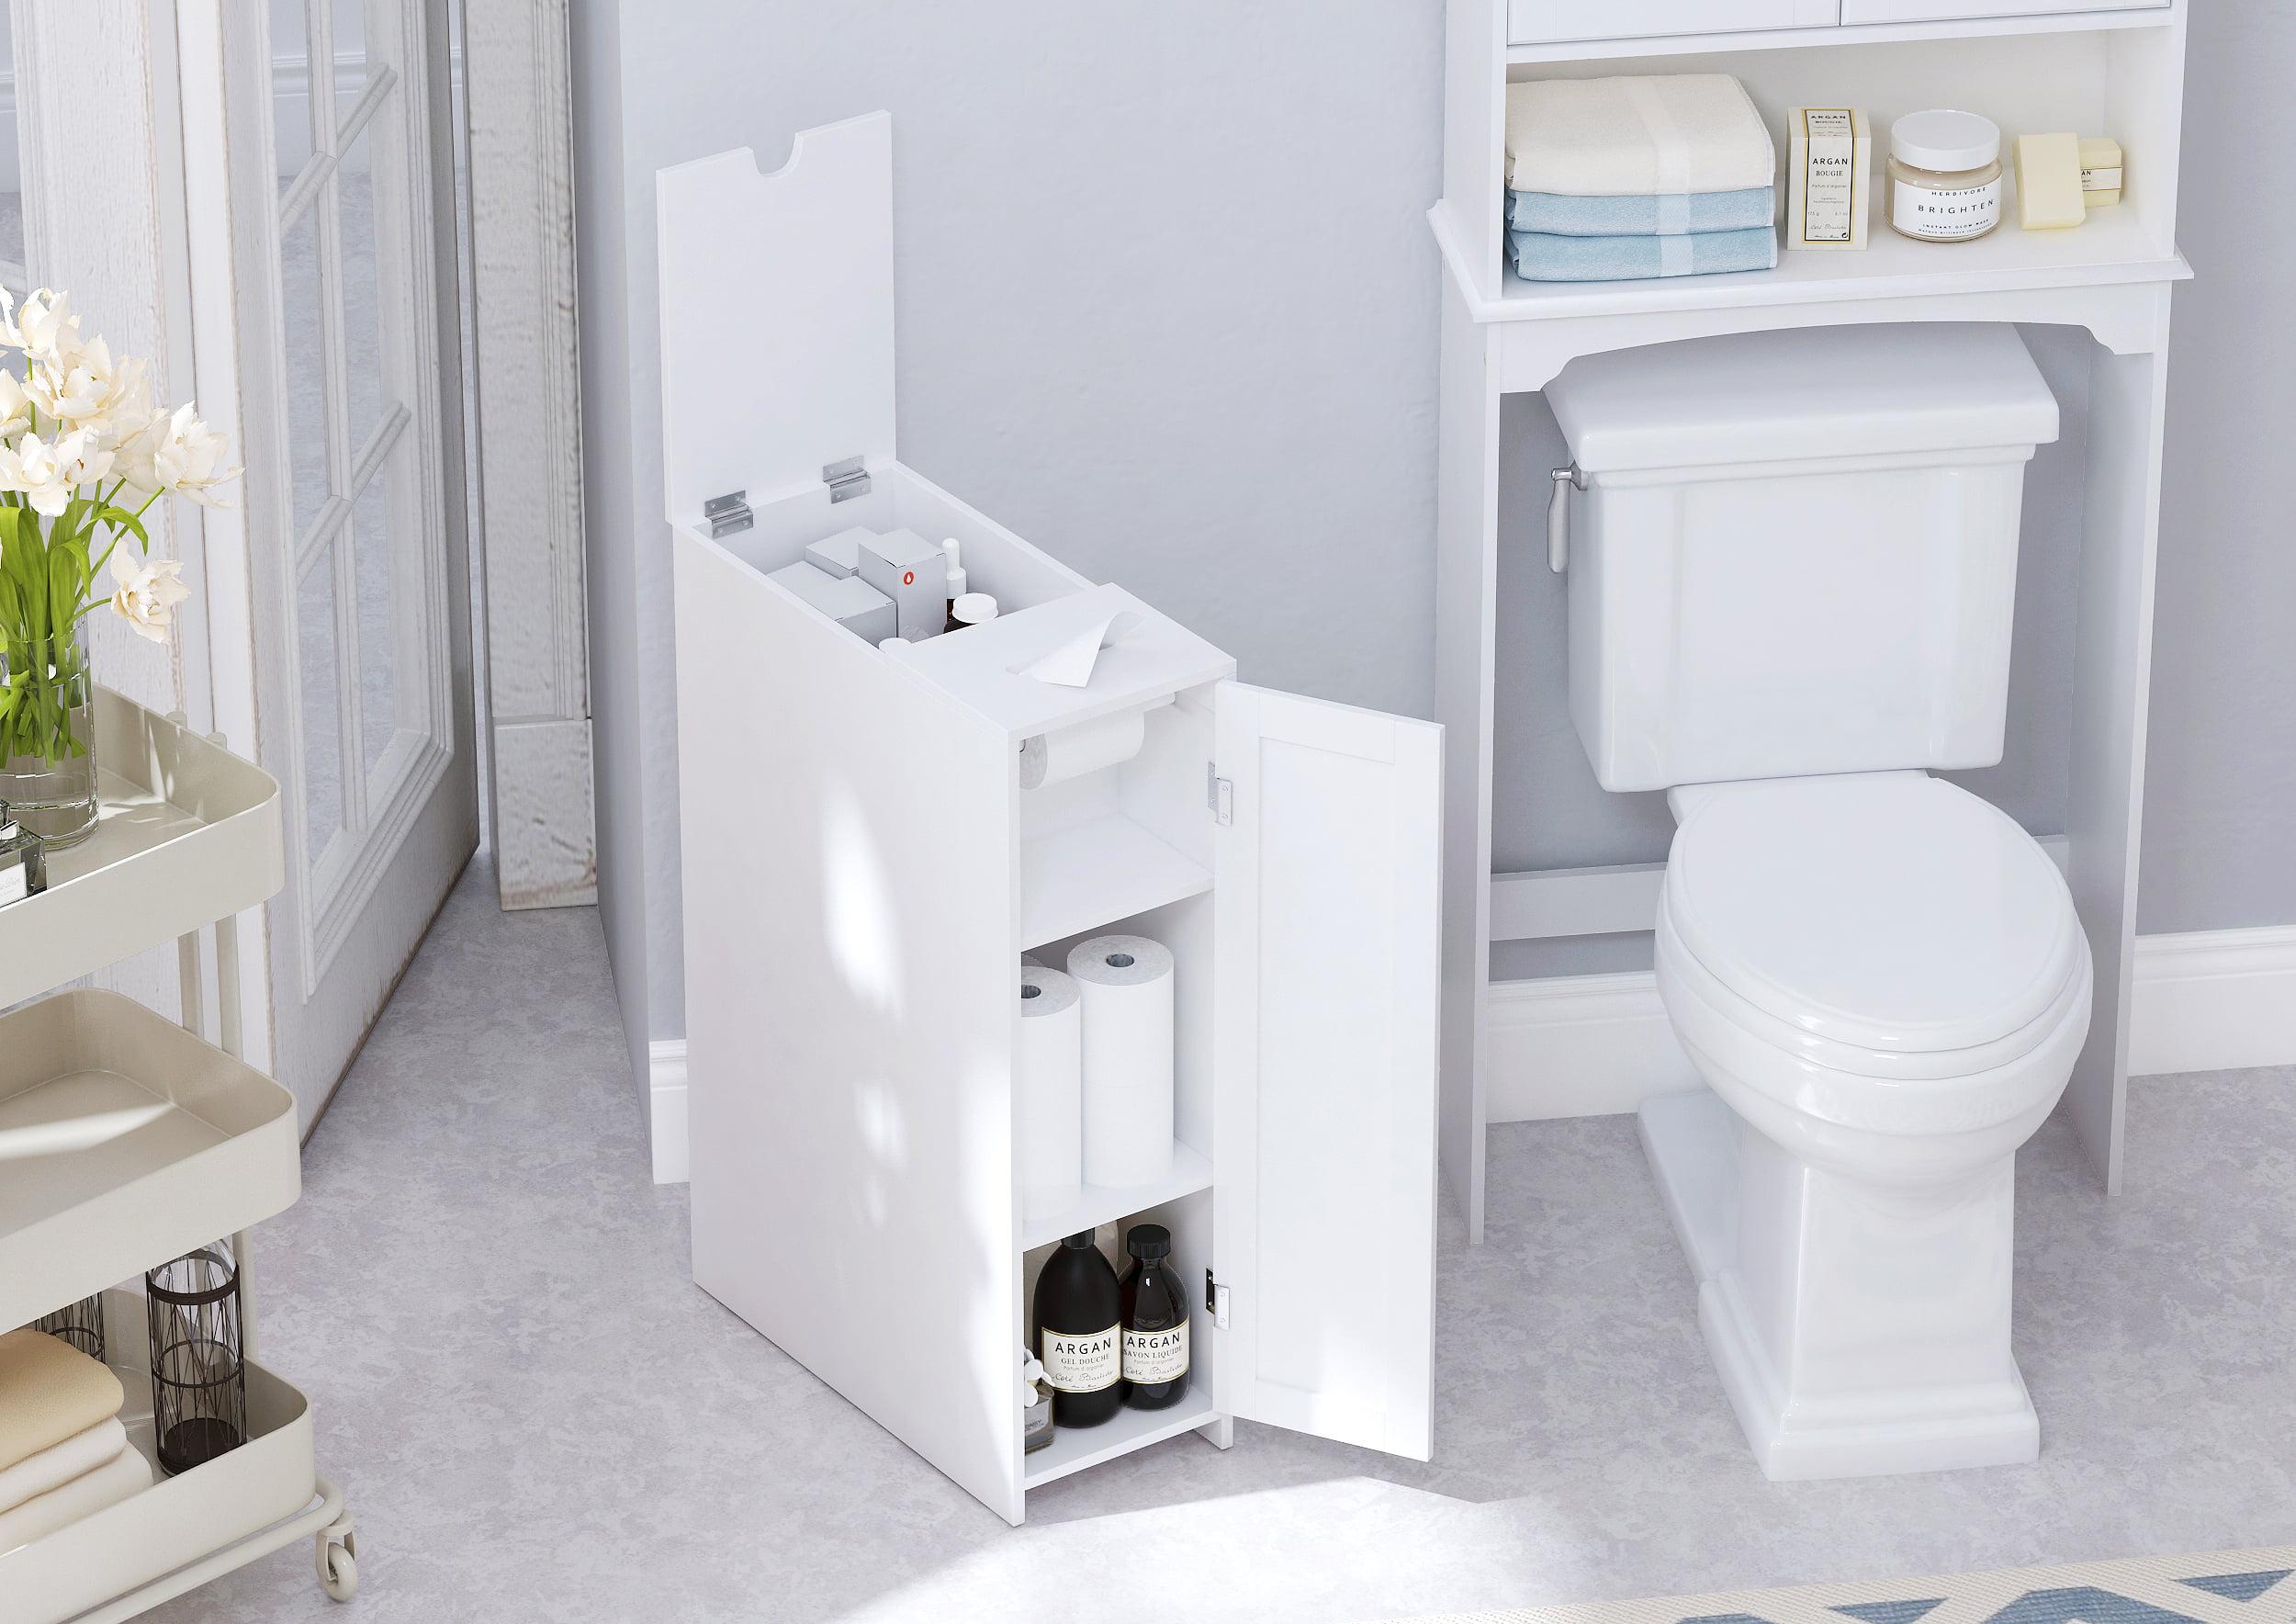 Utex Slim Bathroom Toilet Paper Storage Cabinet Rolling Free Standing Toilet Paper Holder Bathroom Cabinet 9 W X 30 H X 20 D White Walmart Com Walmart Com